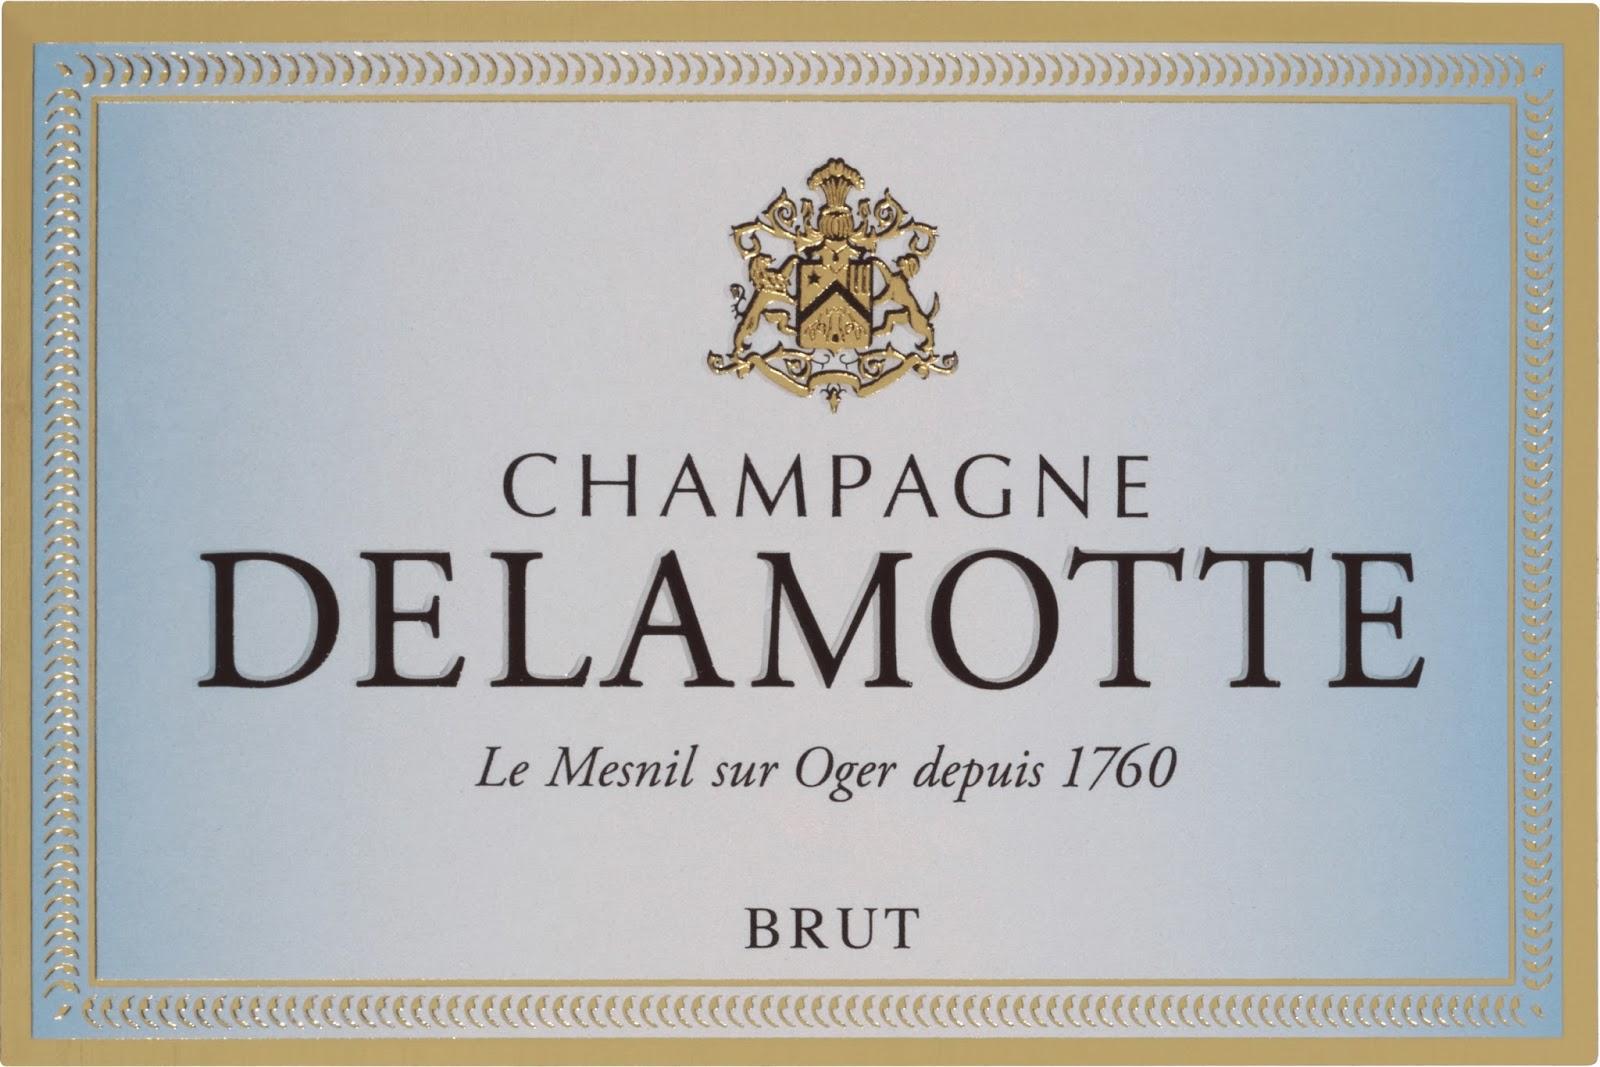 Patrick cappiello 39 s 10 favorite sparkling wines to saber eater ny for Salon blanc de blancs le mesnil sur oger